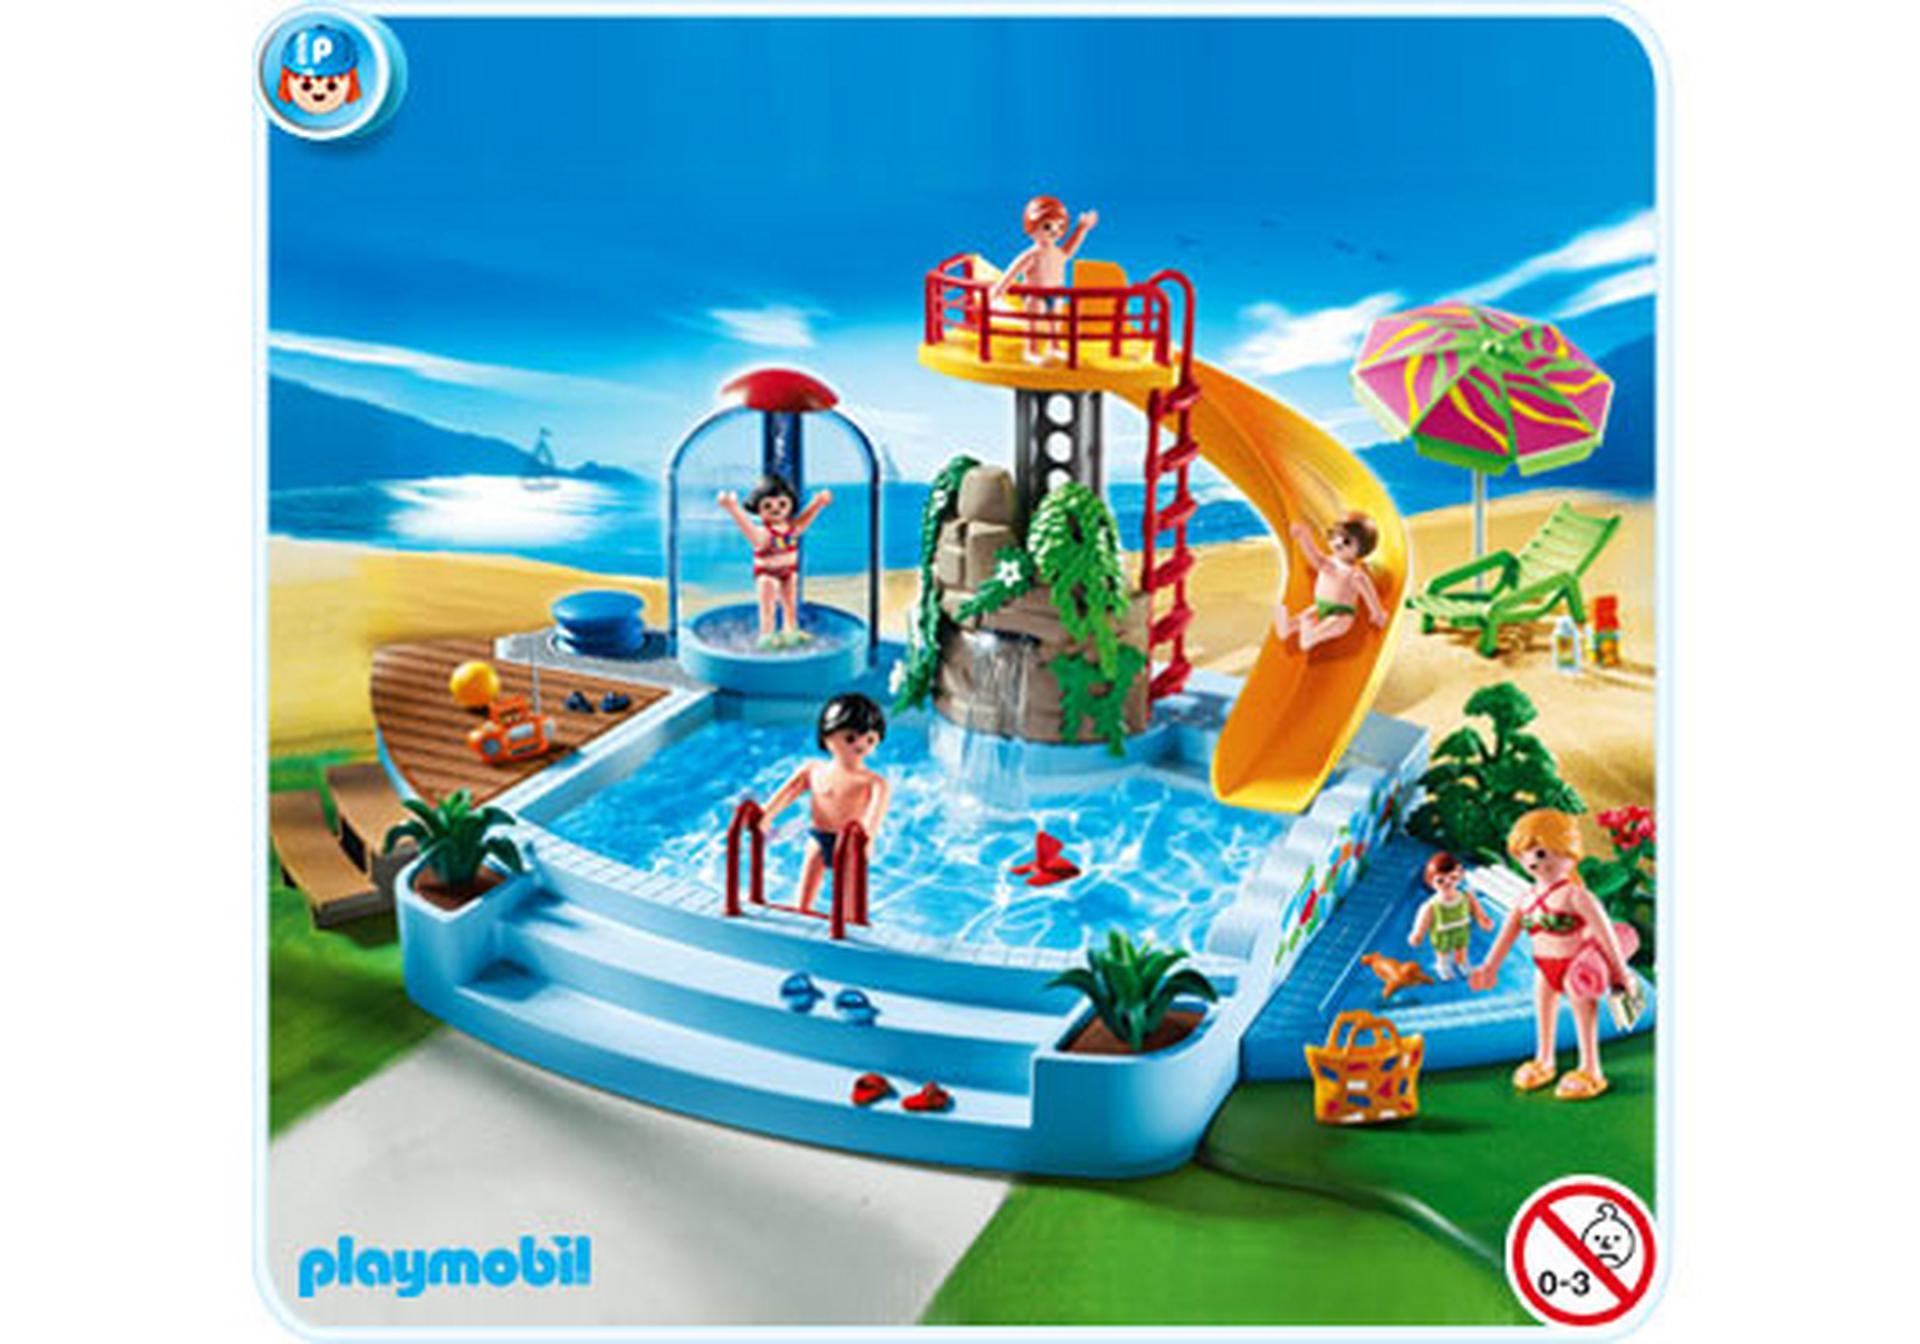 Piscine avec toboggan 4858 a playmobil suisse for Piscine avec terrasse playmobil